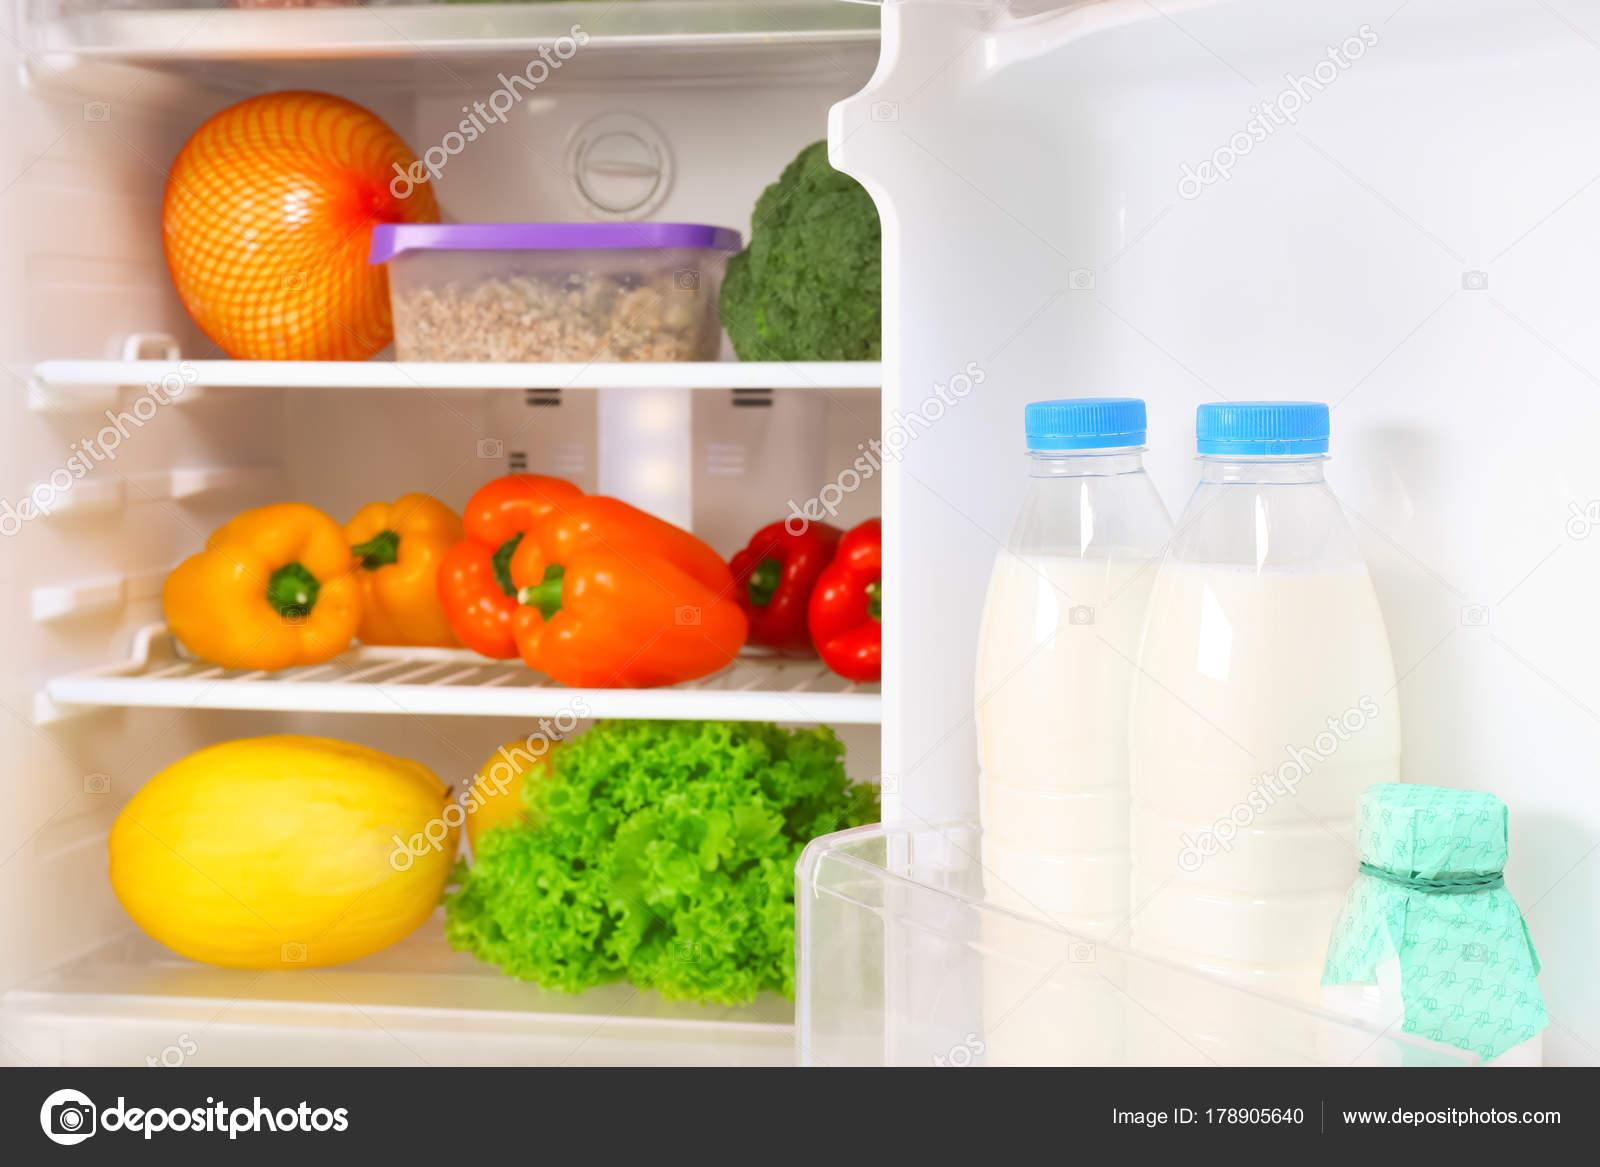 Kuhlschrank Voller Lebensmittel Stockfoto C Belchonock 178905640